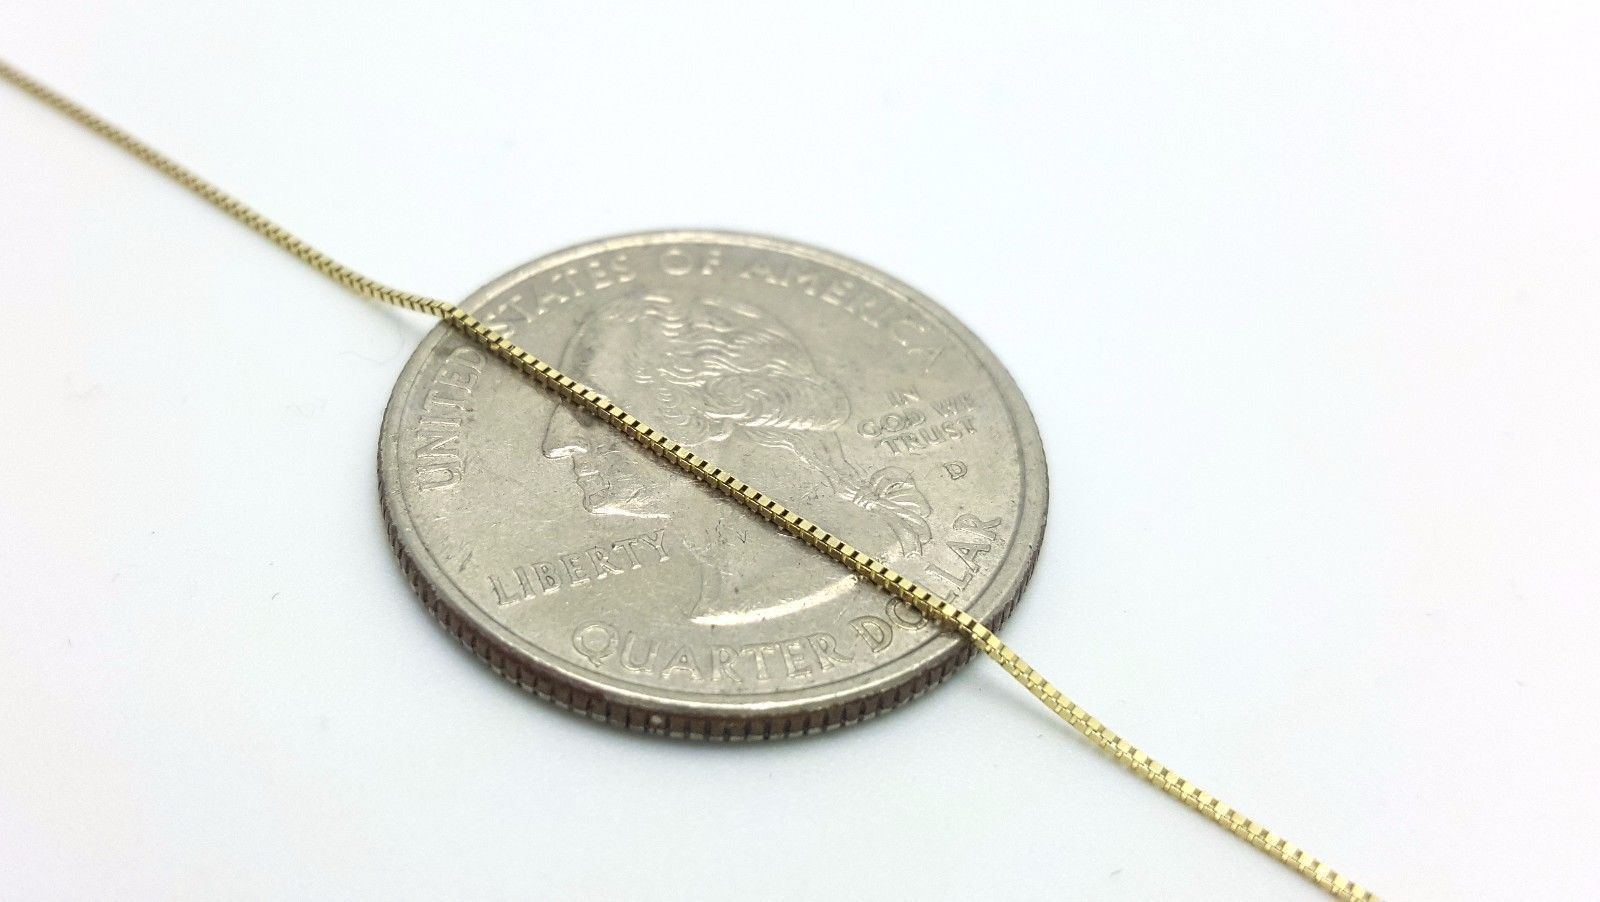 10K Solid Real Gold Italian Box Chain Men's Women's 16″ – 24″ inches brand new Fine Jewelry